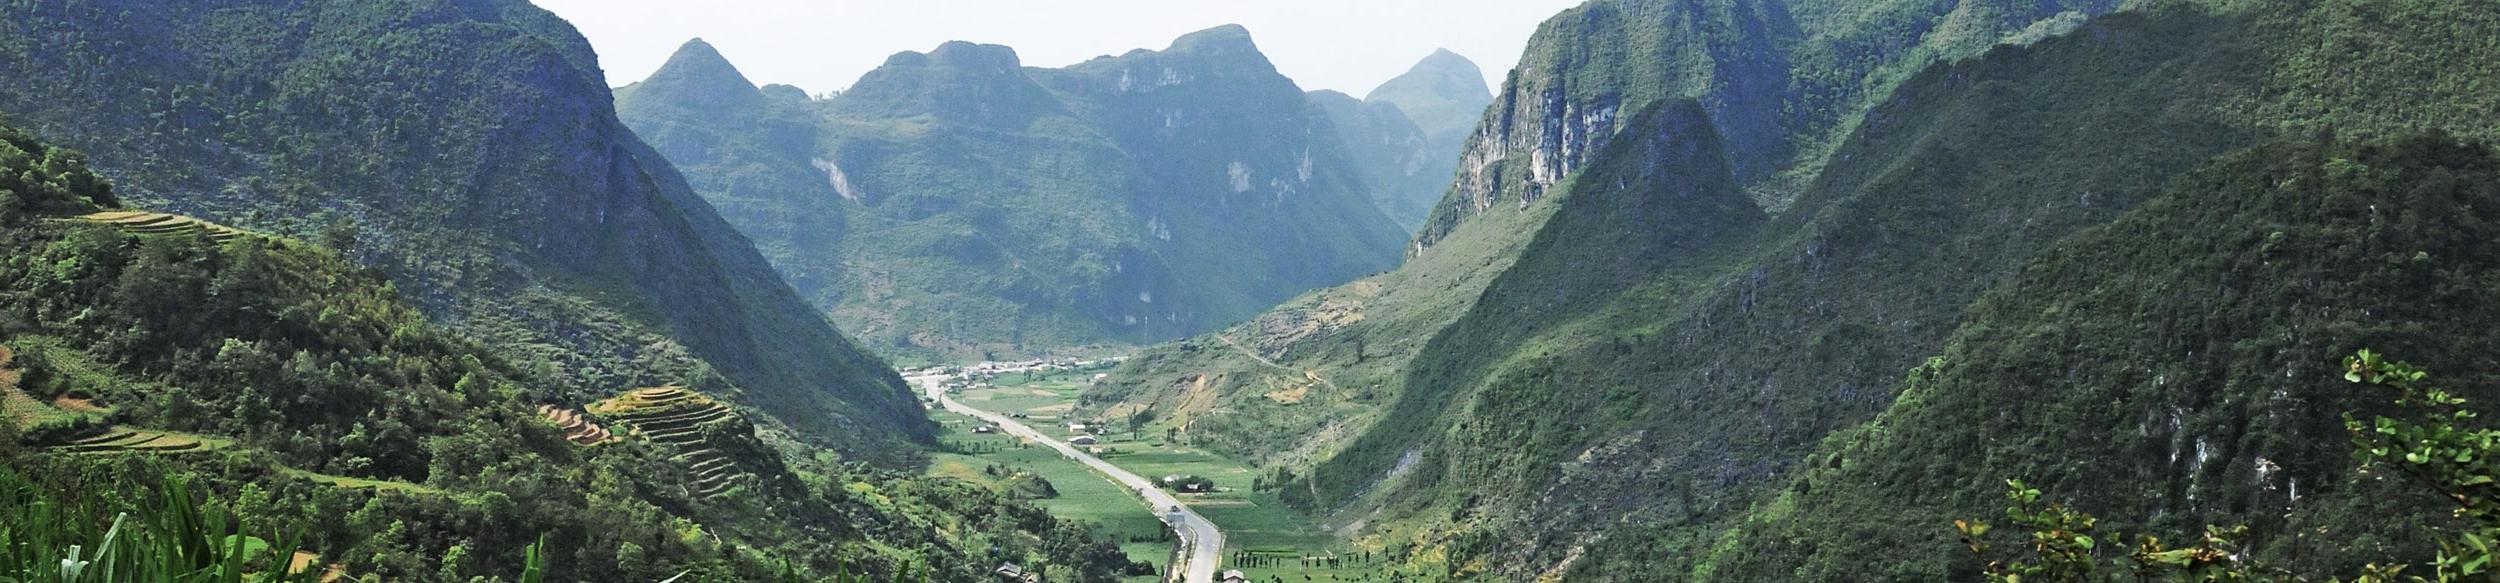 Découvrir Ha Giang avec Carnets d'Asie